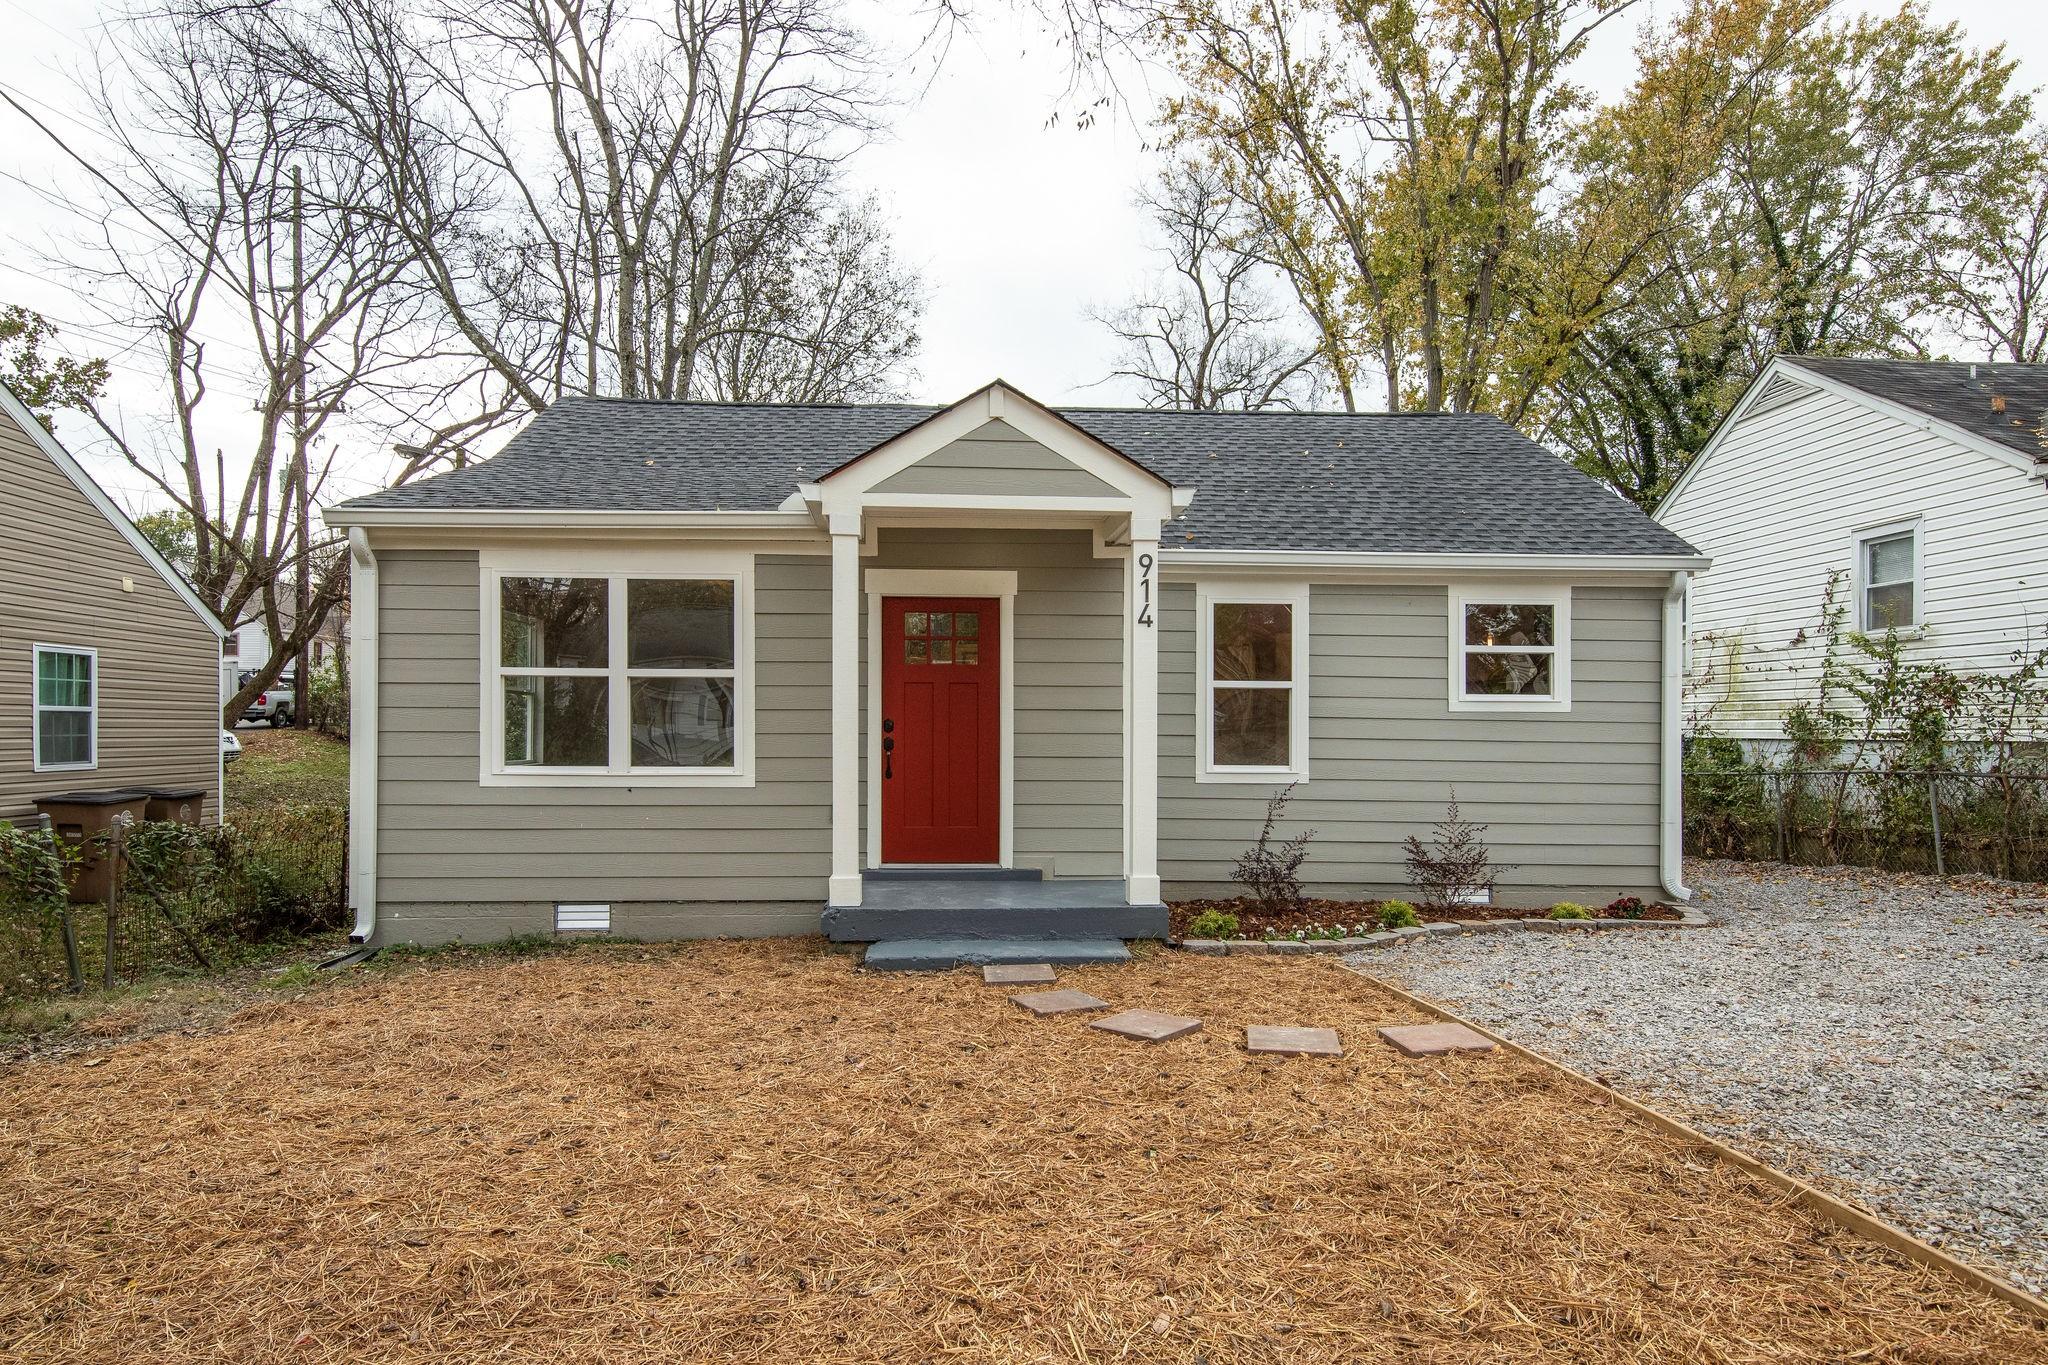 914 Broadmoor Dr, Nashville, TN 37216 - Nashville, TN real estate listing